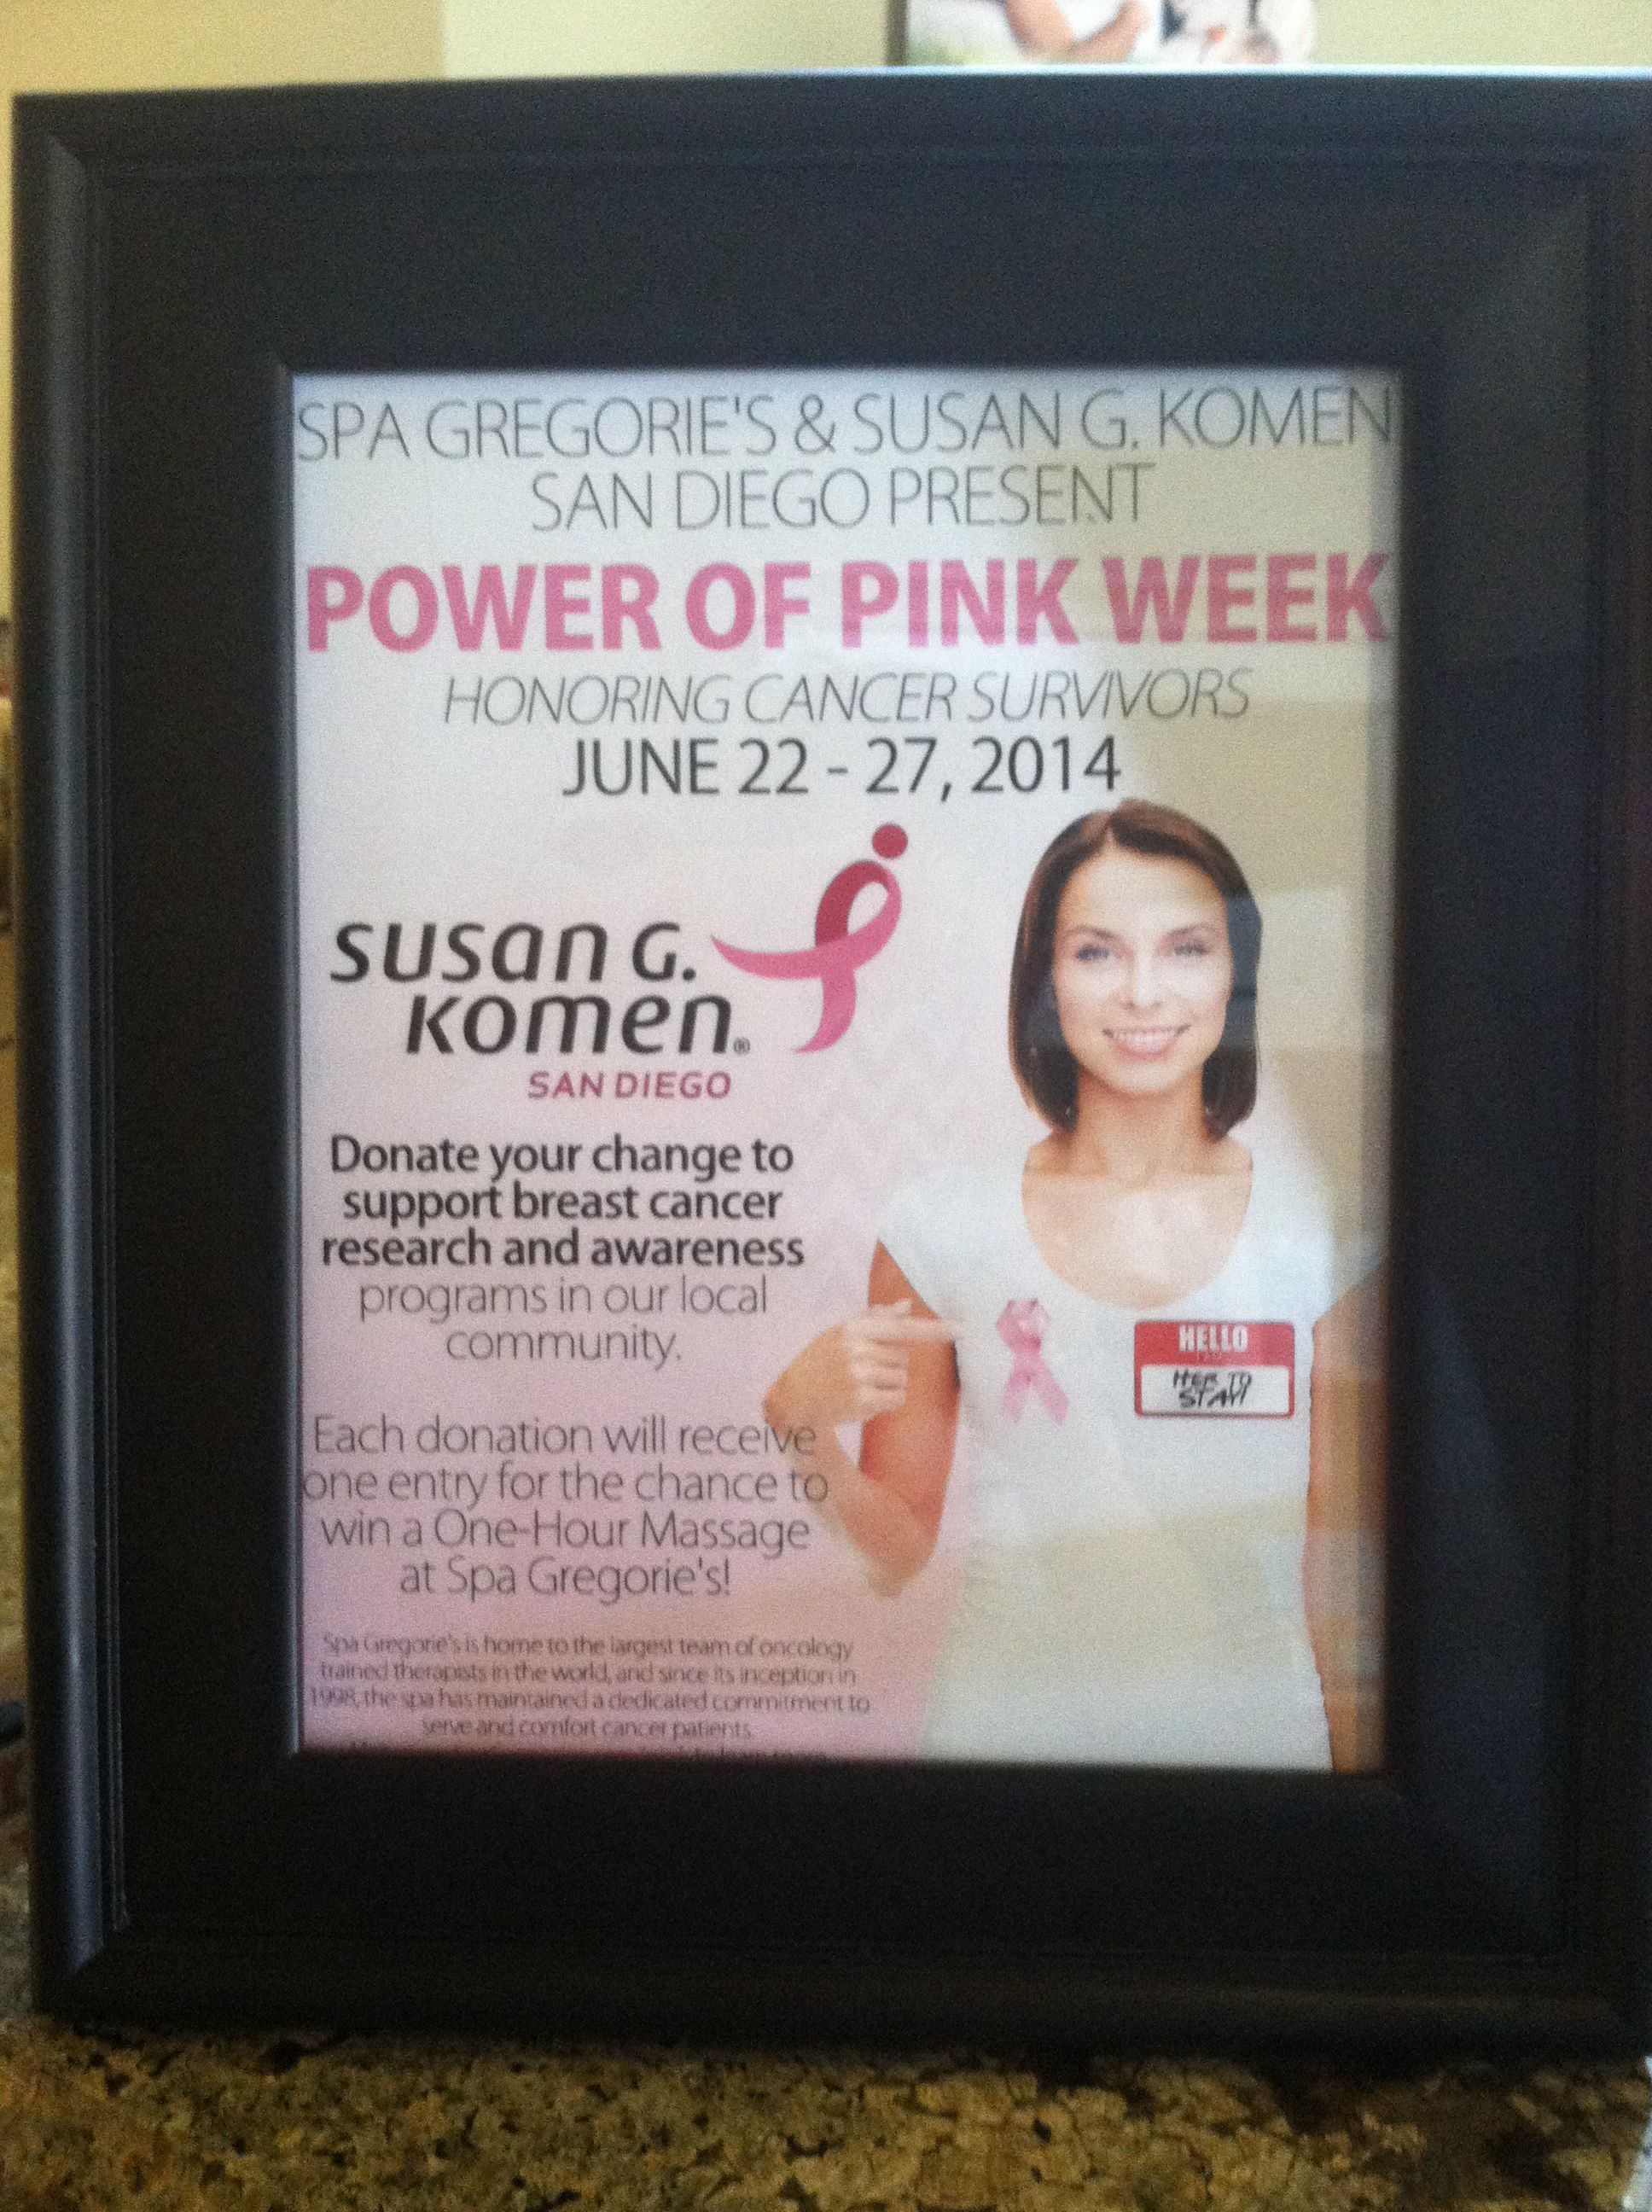 Spa Gregorie's and Susan G. Komen San Diego present Power of Pink Week! #charity #cure #survivor